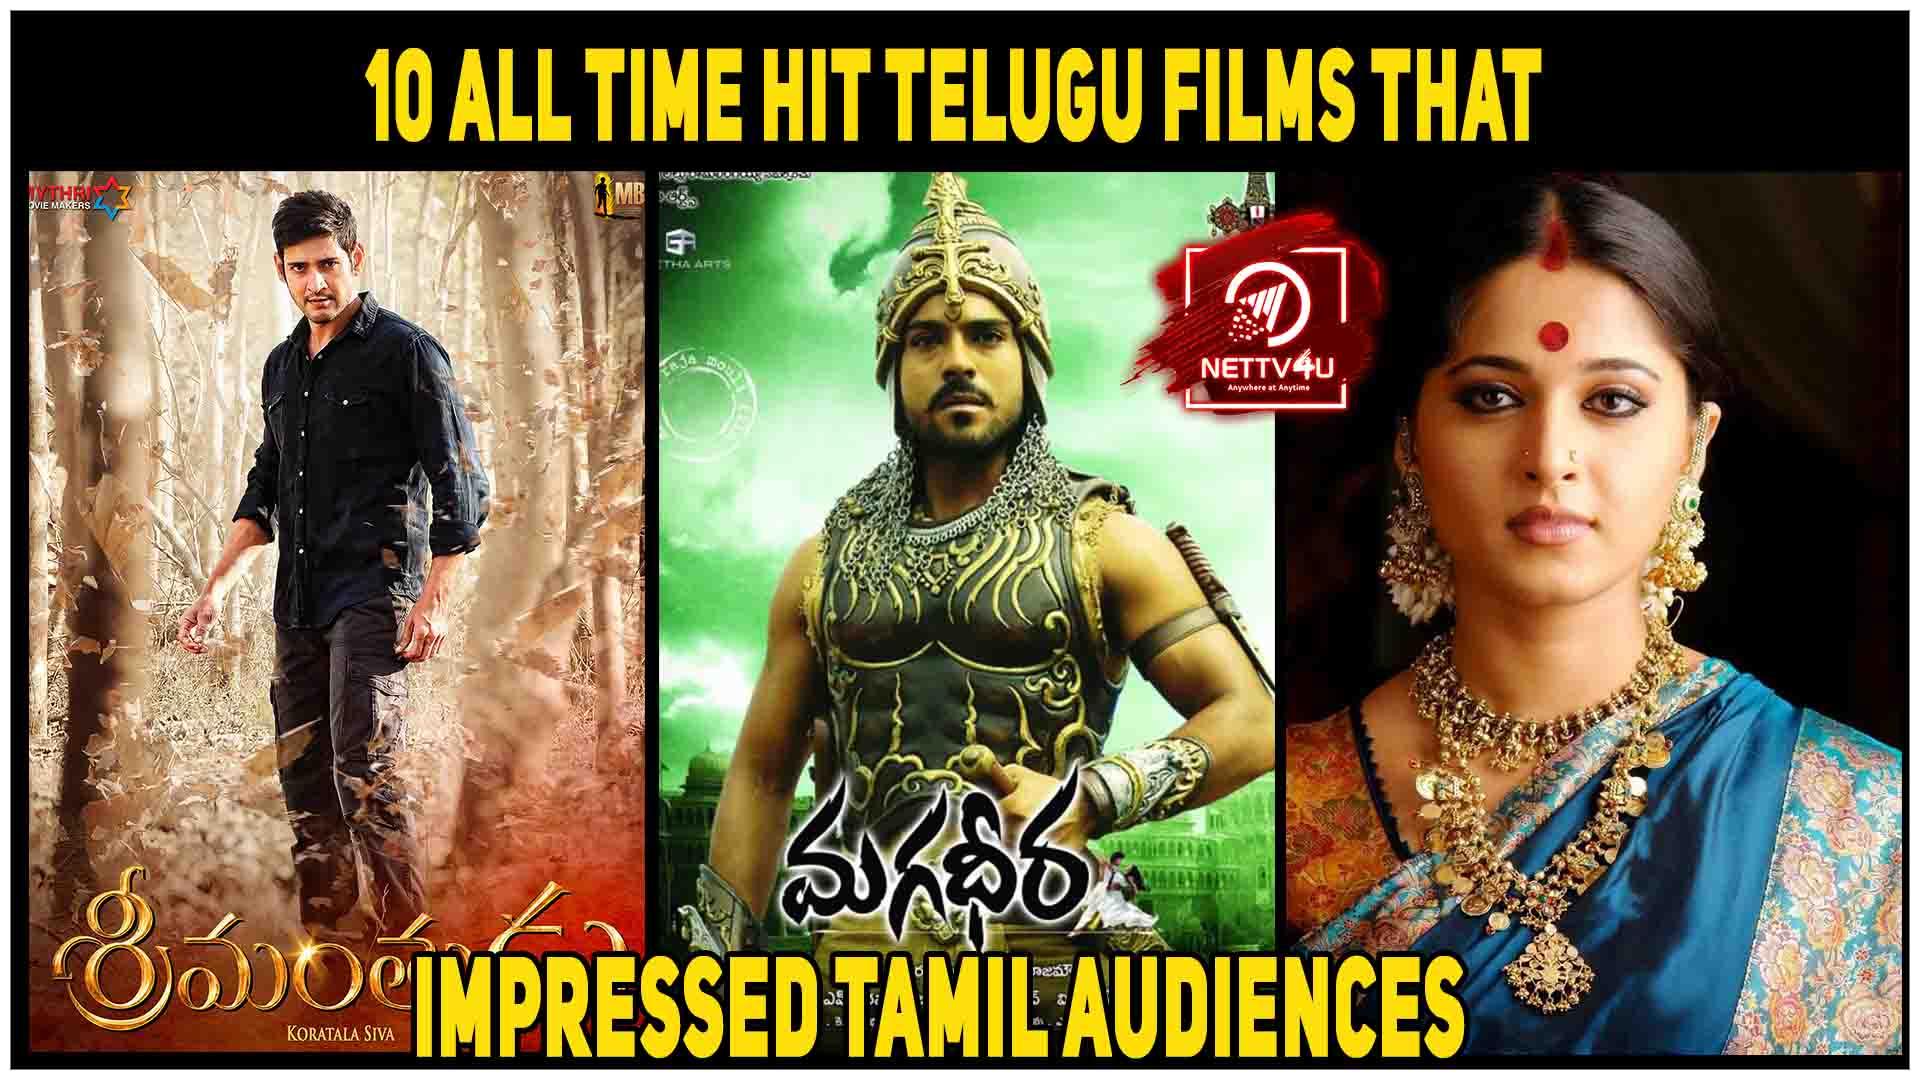 10 All Time Hit Telugu Films That Impressed Tamil Audiences